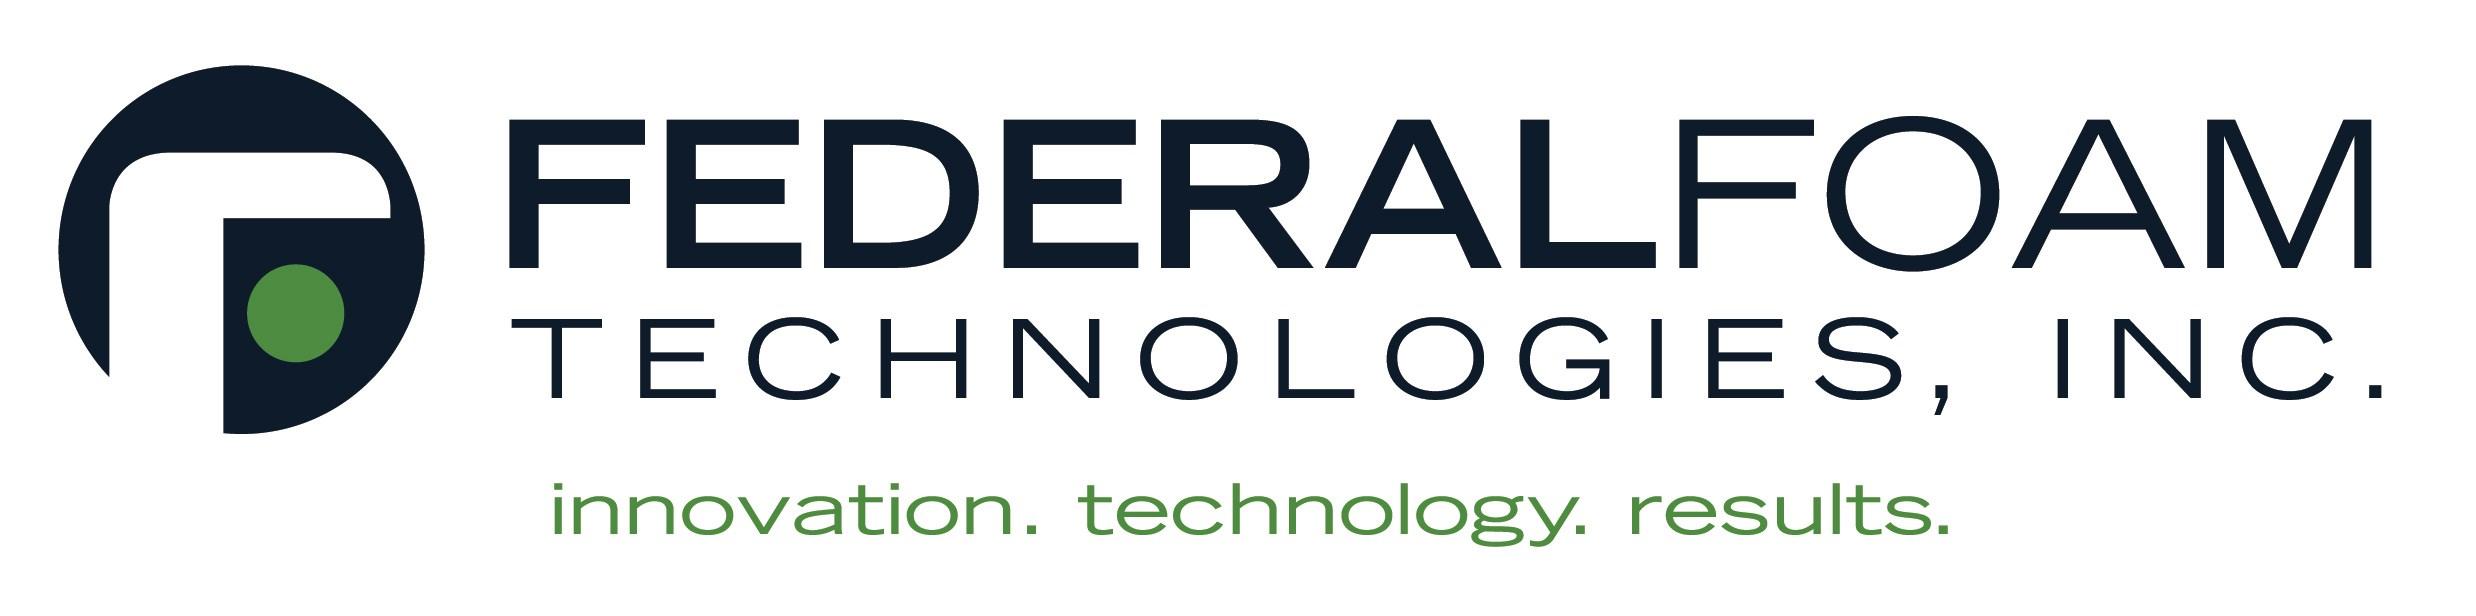 Federal Foam Technologies